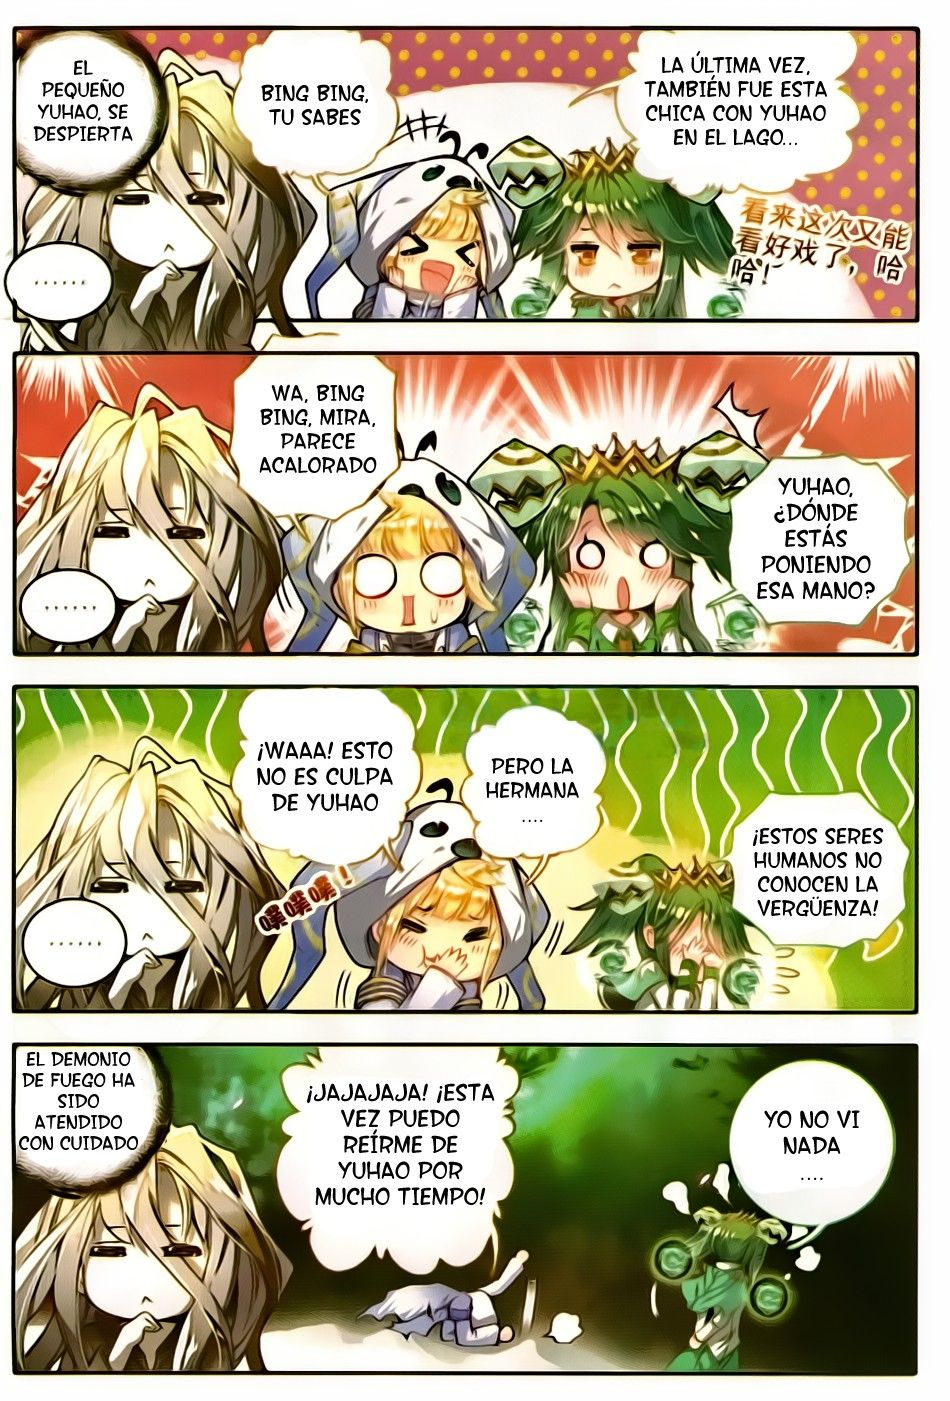 http://c5.ninemanga.com/es_manga/pic2/33/16417/513257/39a1dafc5f8576b47d615f12de932e09.jpg Page 6